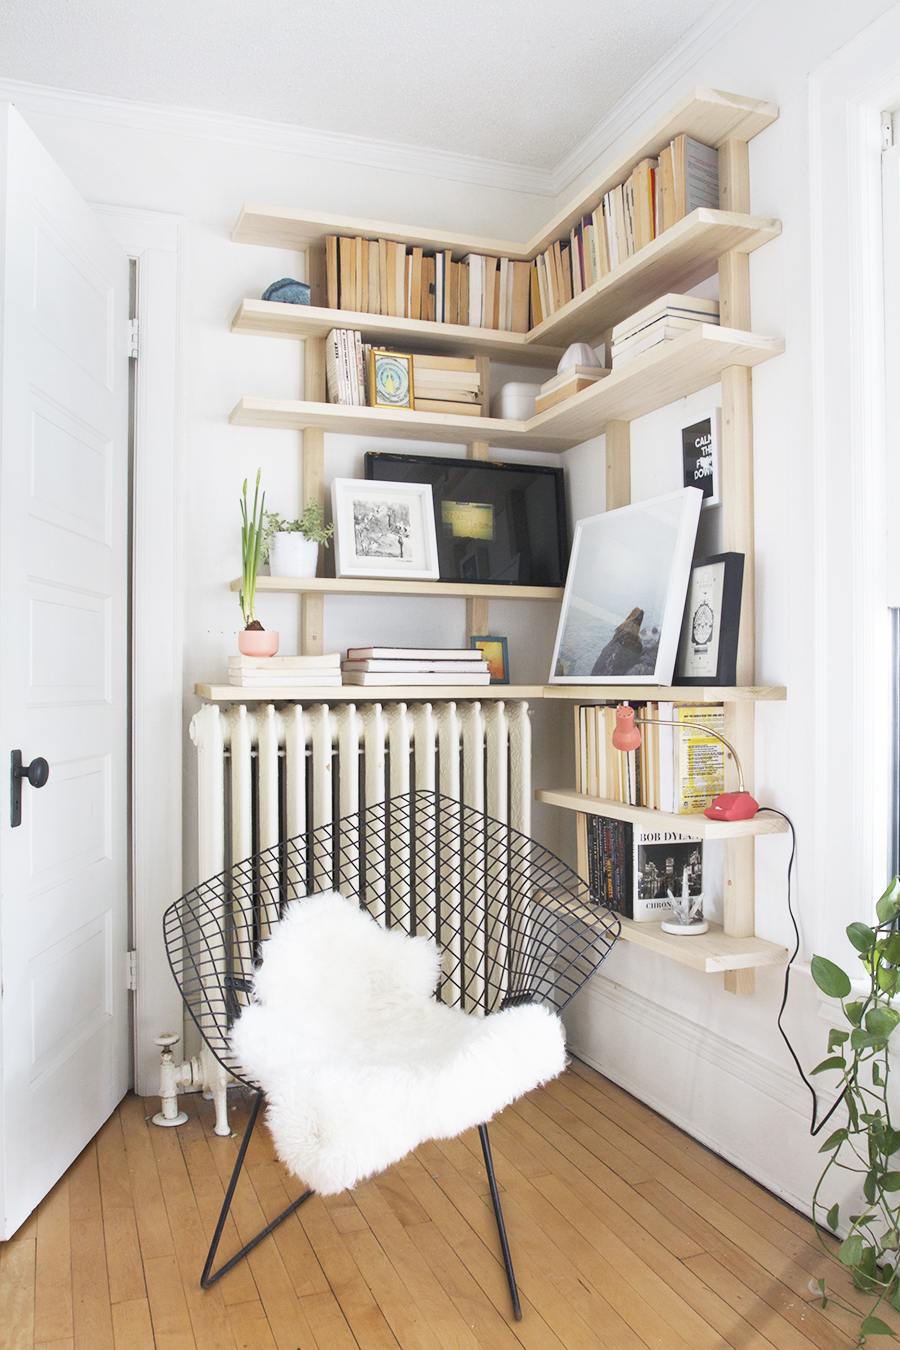 Interesting Scandi Influenced Shelving Deuce Cities Henhouse Bookshelf Design Shelves interior Corner Bookshelf Modern